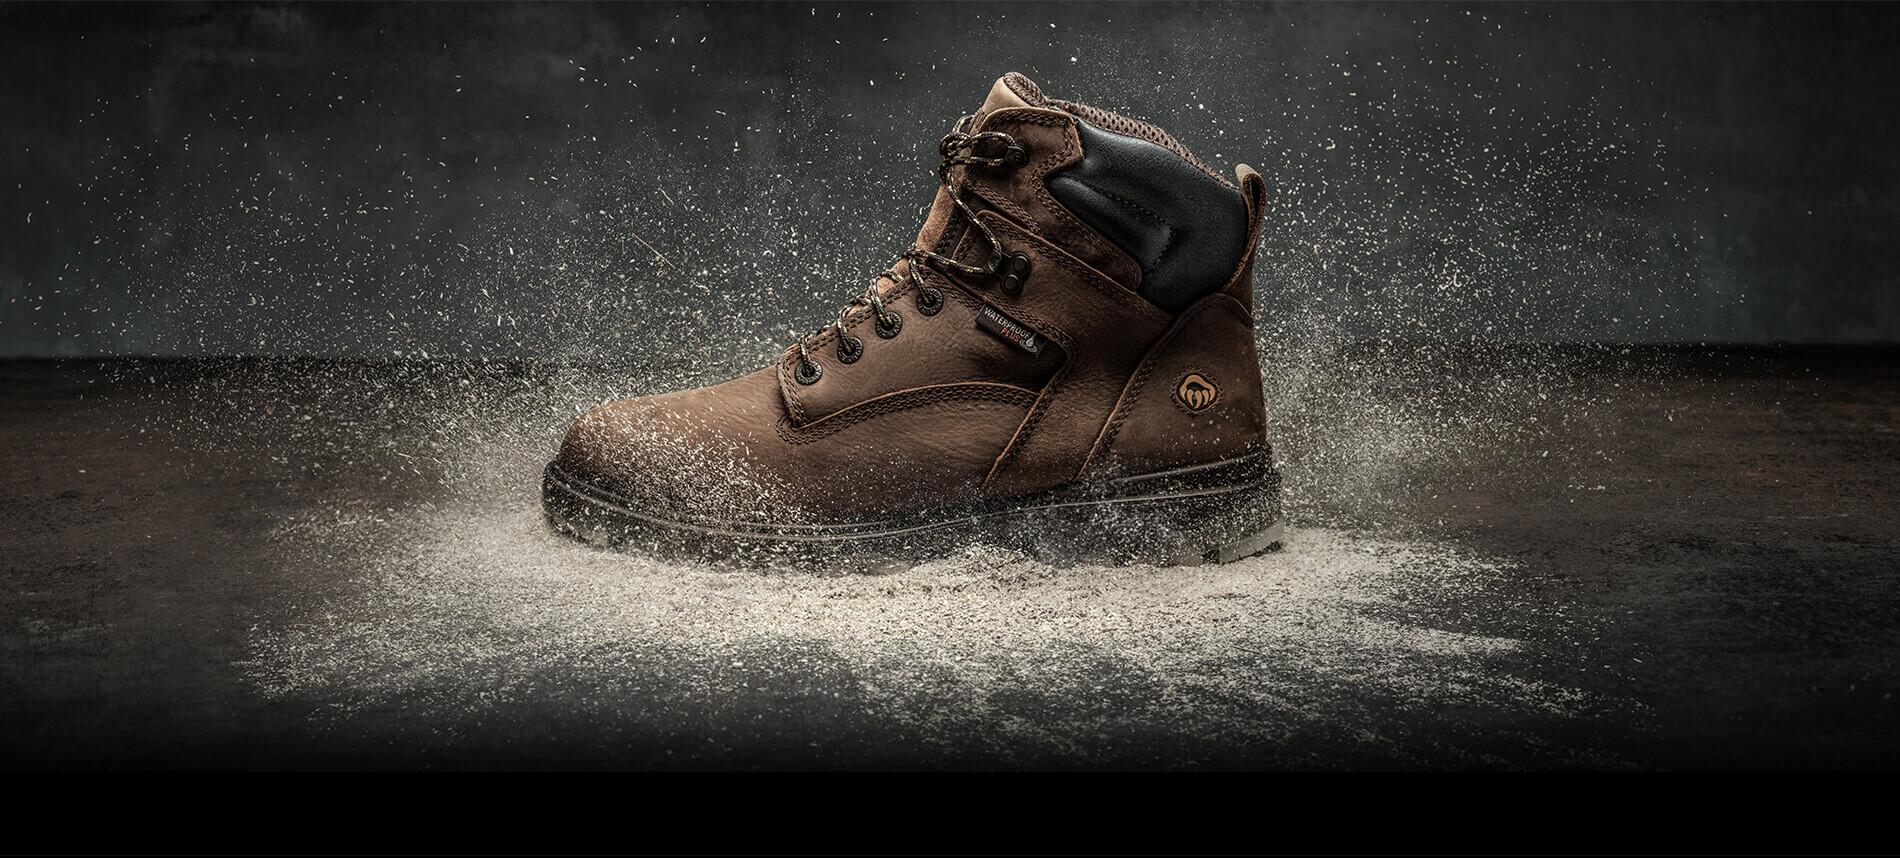 76fe99fe4d6 Official Wolverine.com  Tough Work Boots